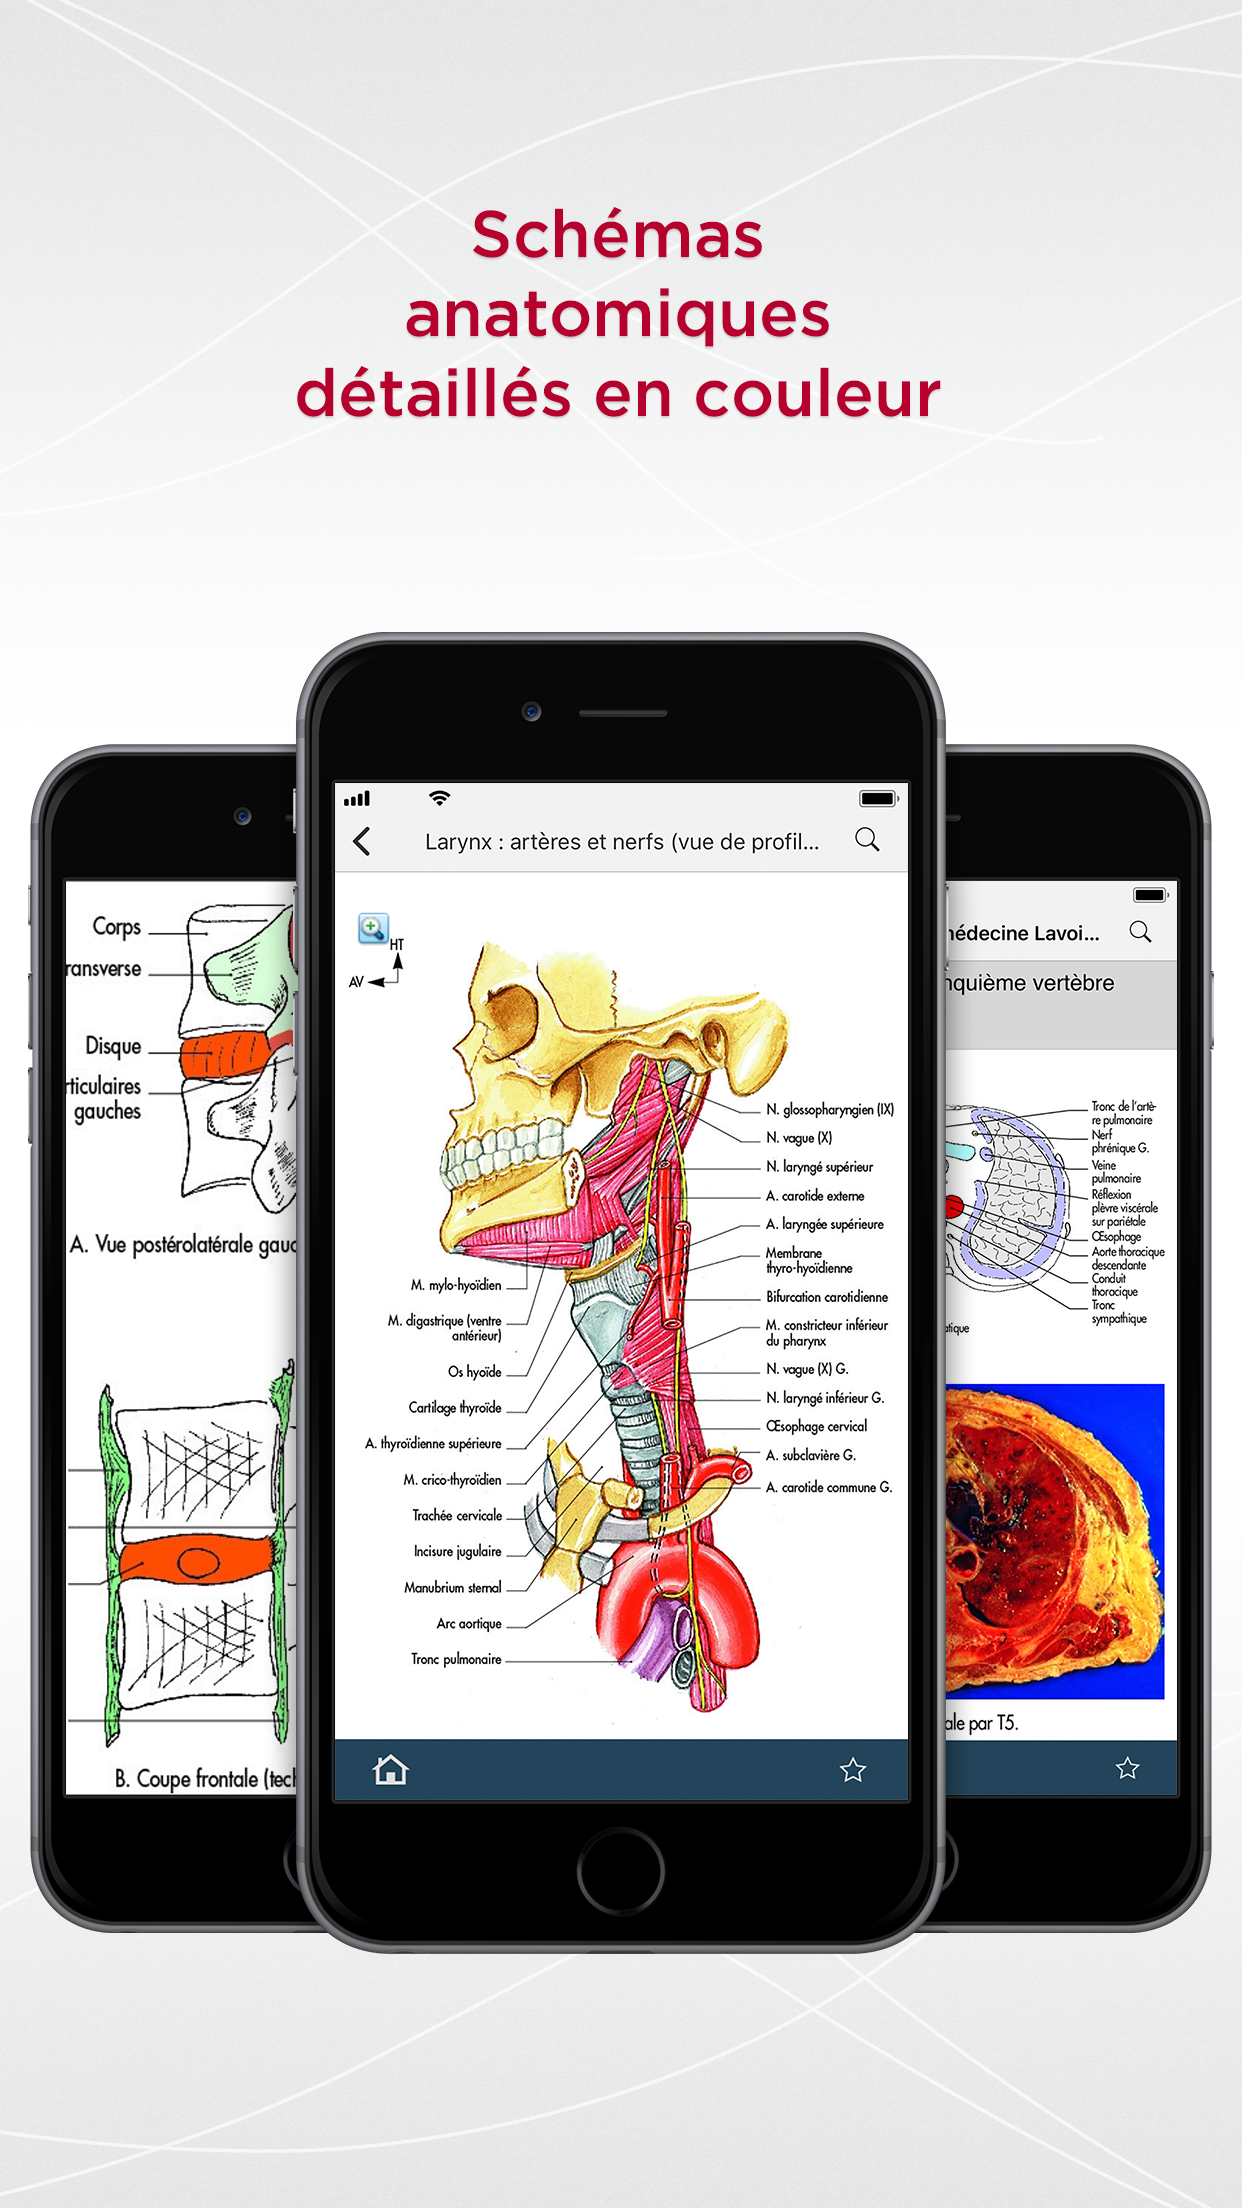 Großzügig Anatomie App Für Ipad Fotos - Anatomie Ideen - finotti.info